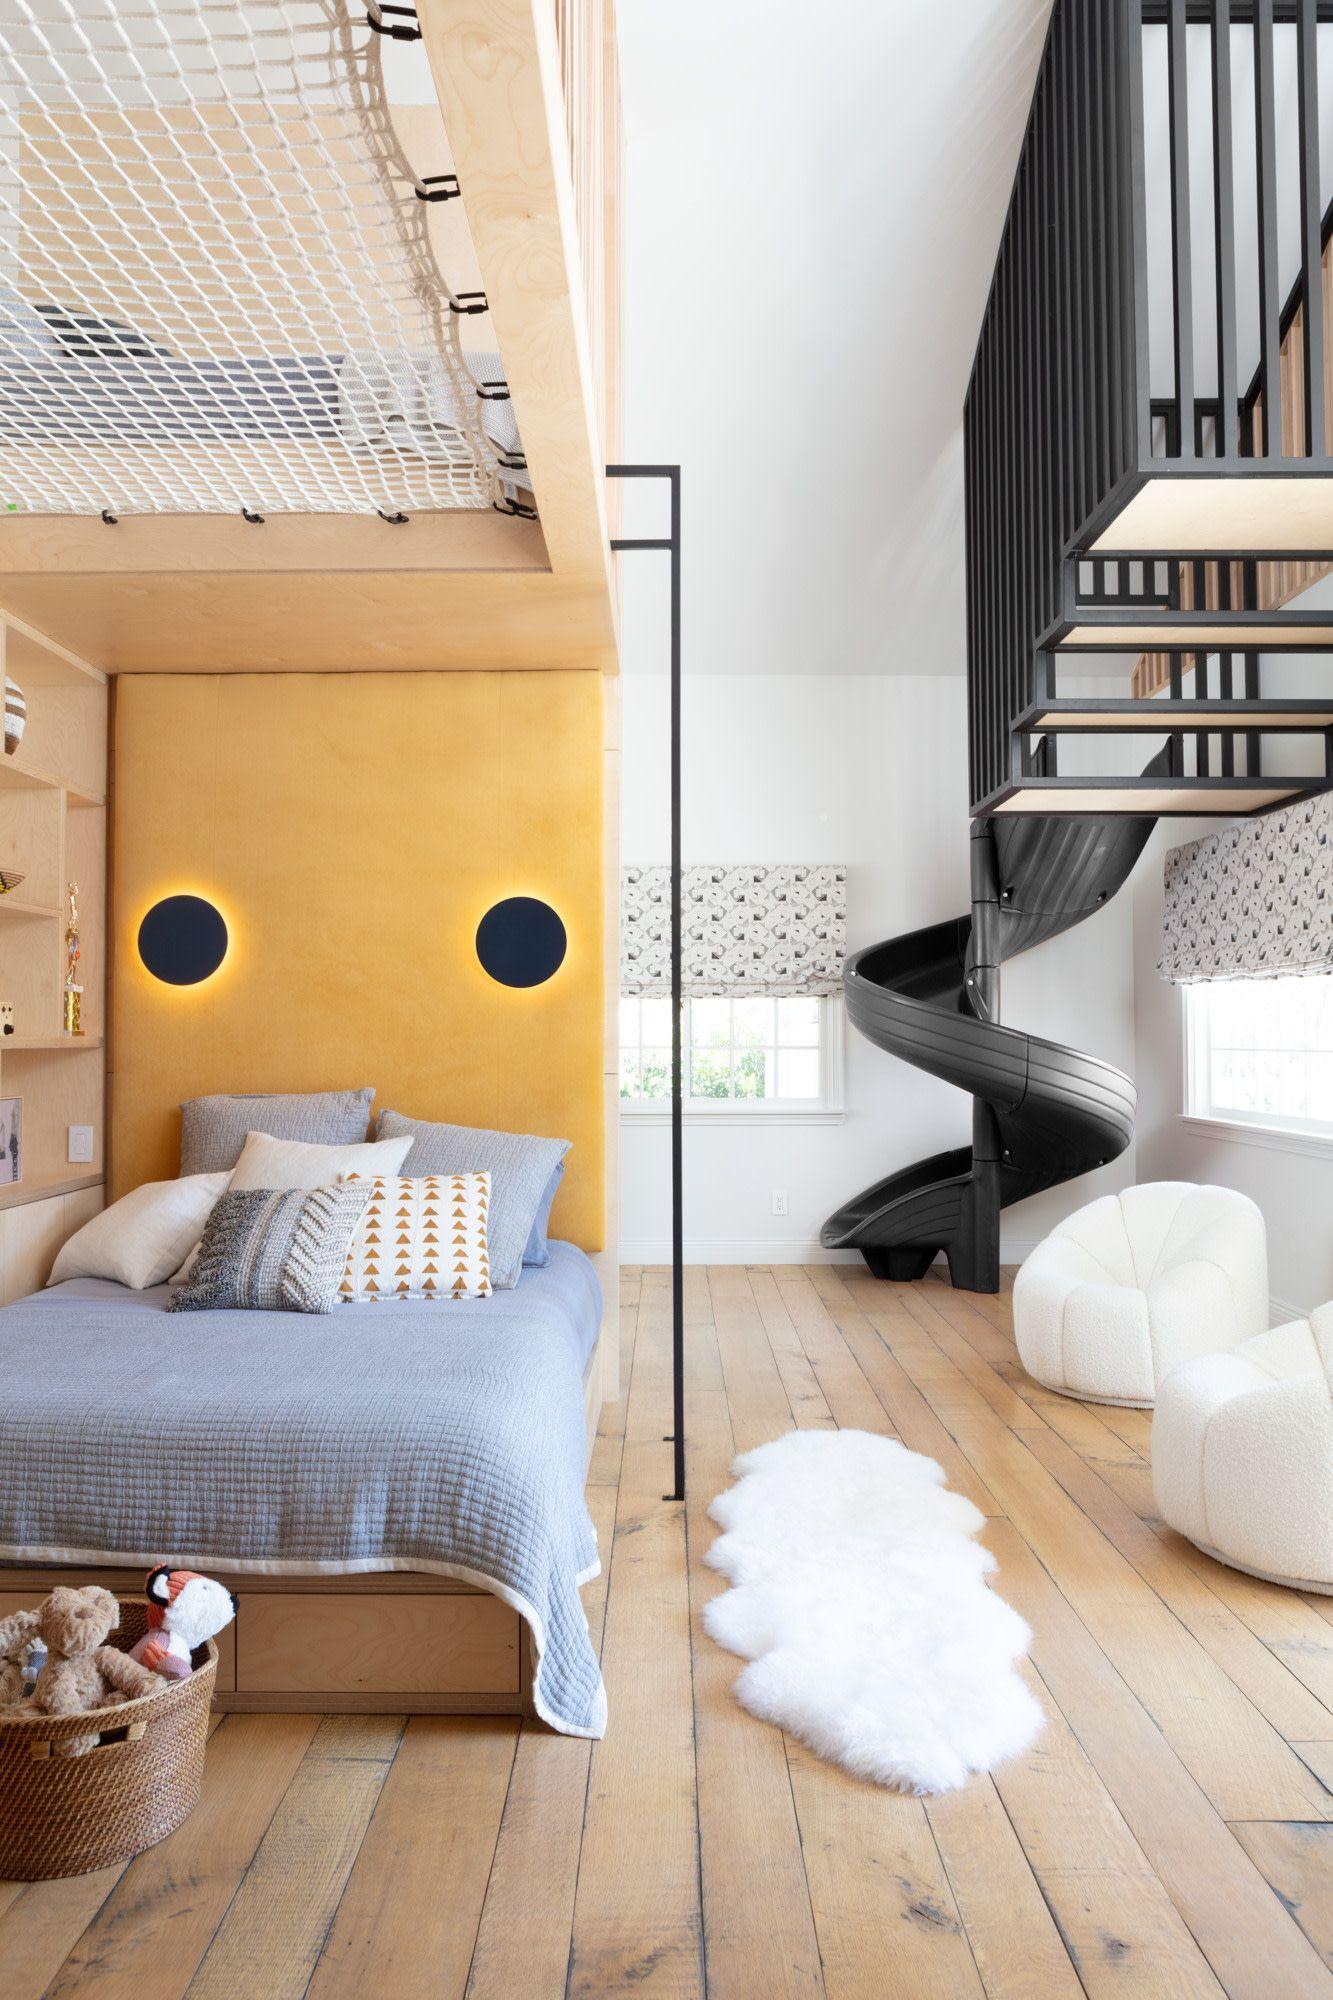 The Most Stylish Kids Rooms We Ve Ever Seen Boy Bedroom Design Little Boy Bedroom Ideas Cool Bedrooms For Boys